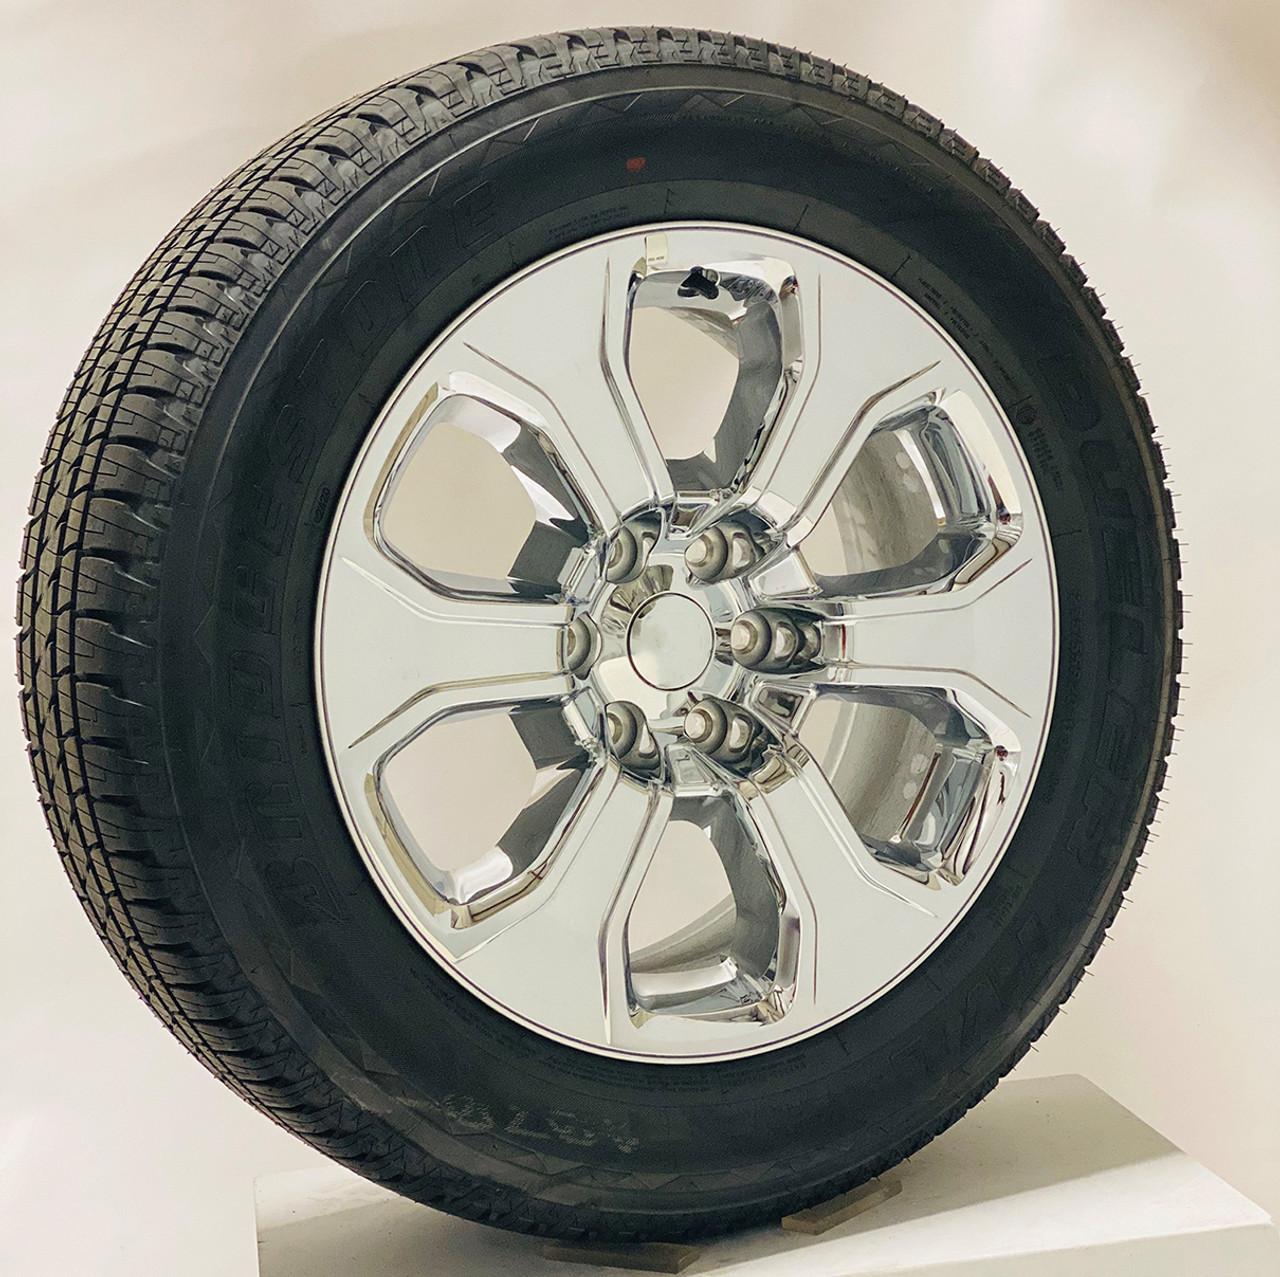 New 2020 Takeoff 20 Chrome Wheels With 275 55r20 Bridgestone Dueler H L Tires